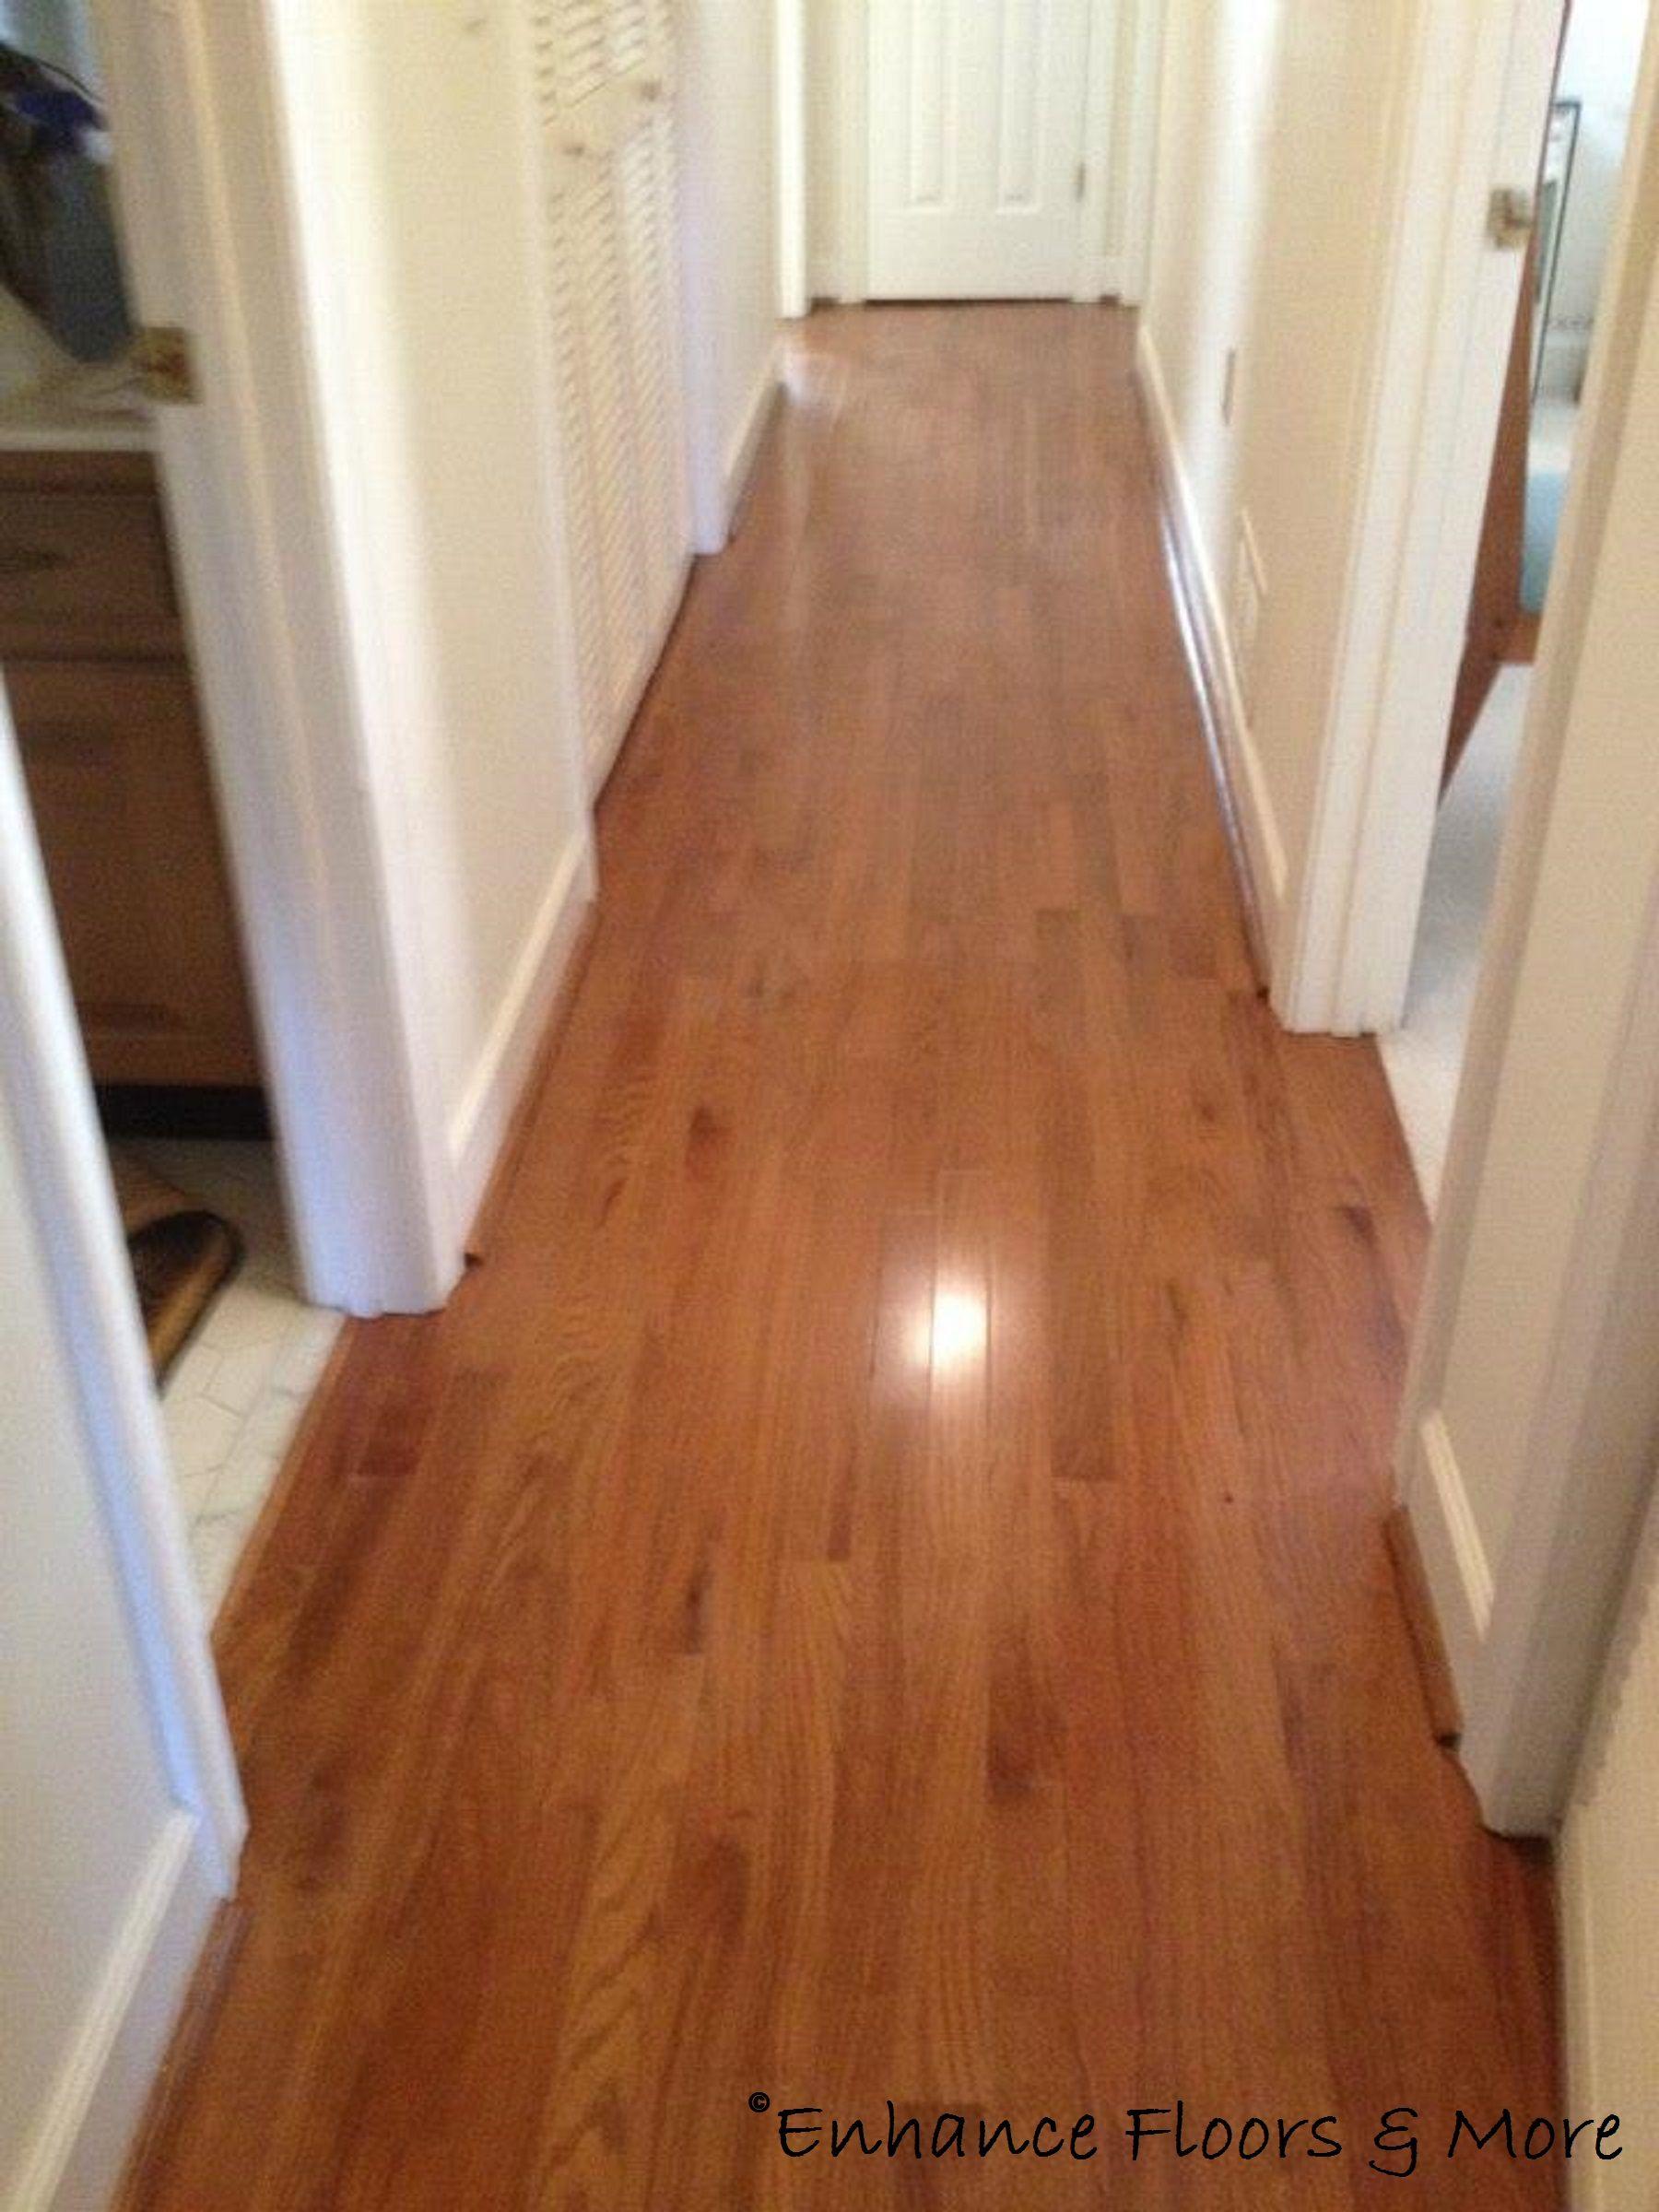 solid somerset dark hardwood shf chocolate and value flooring wood westchester floors darkchocolate engineered